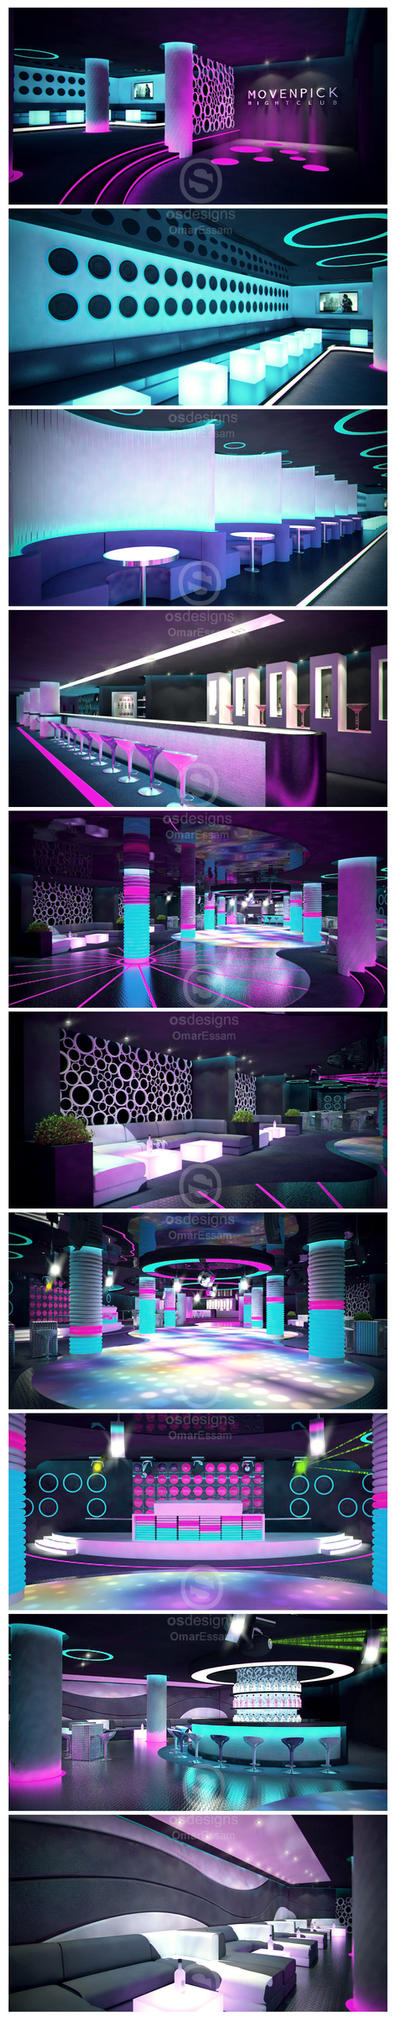 Movenpick - Nightclub Shots by dizzy-miro